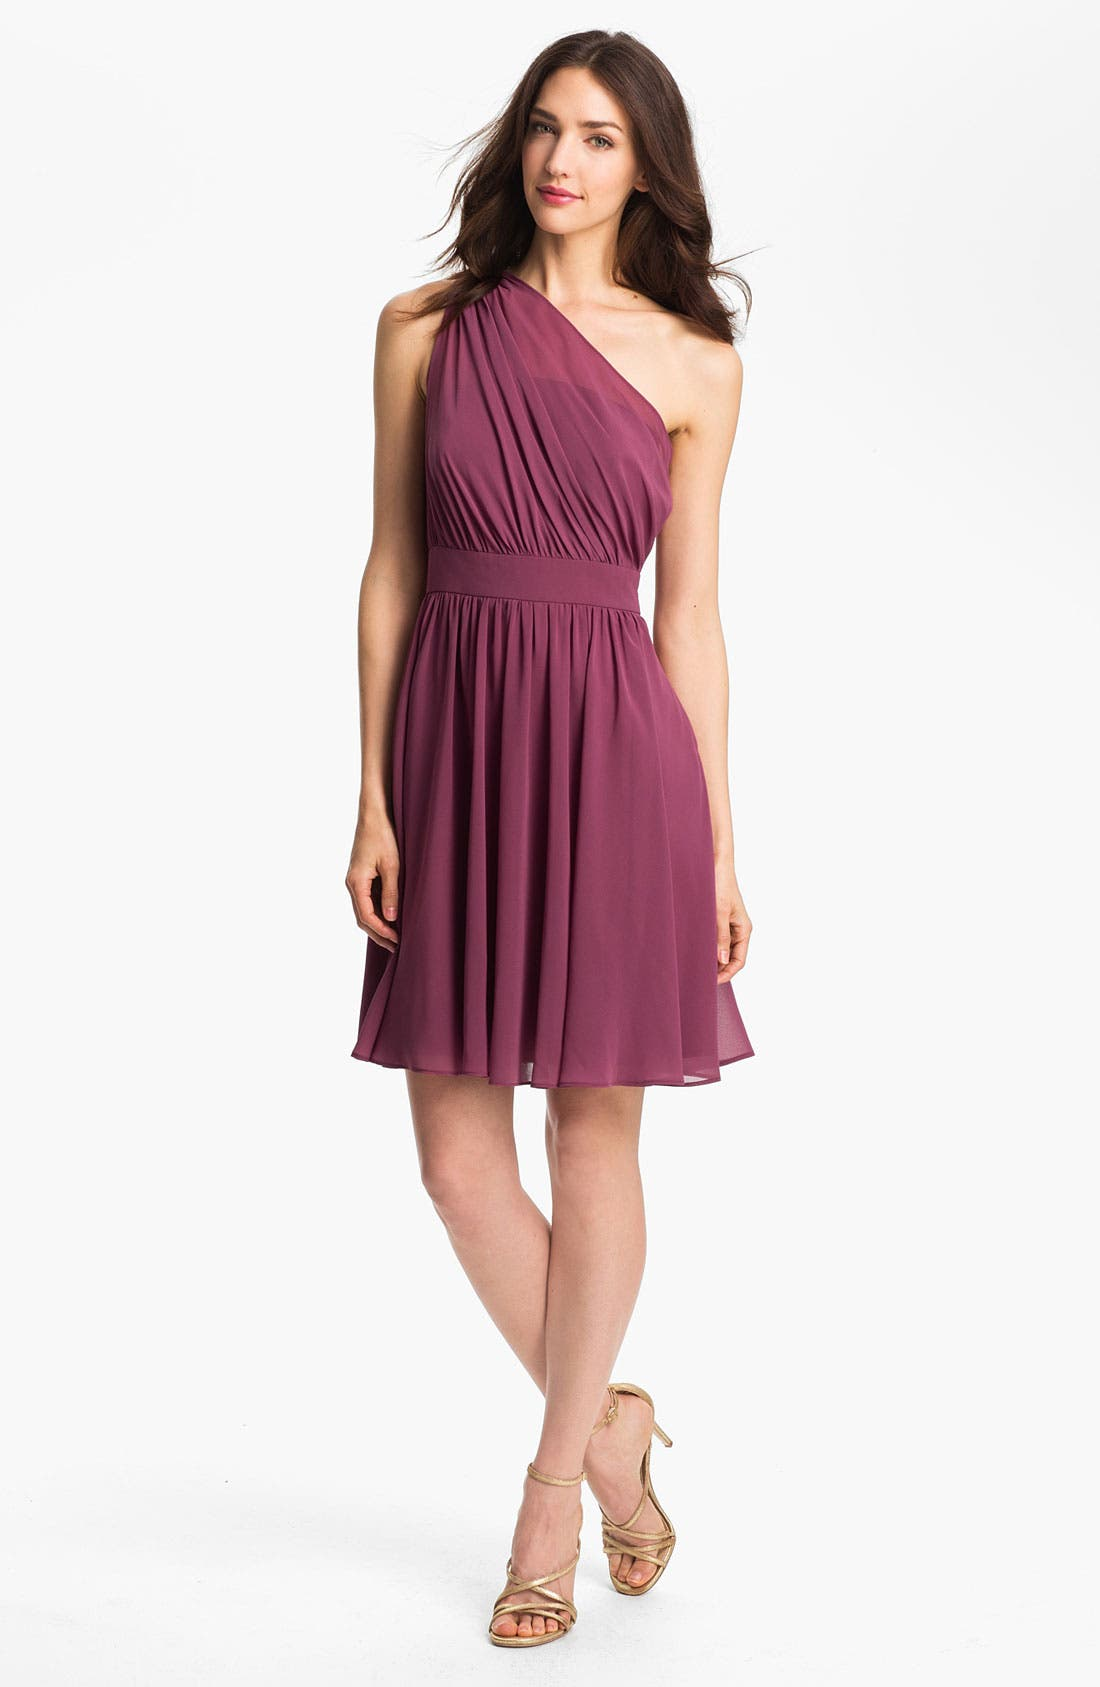 Main Image - Suzi Chin for Maggy Boutique One Shoulder Chiffon Dress